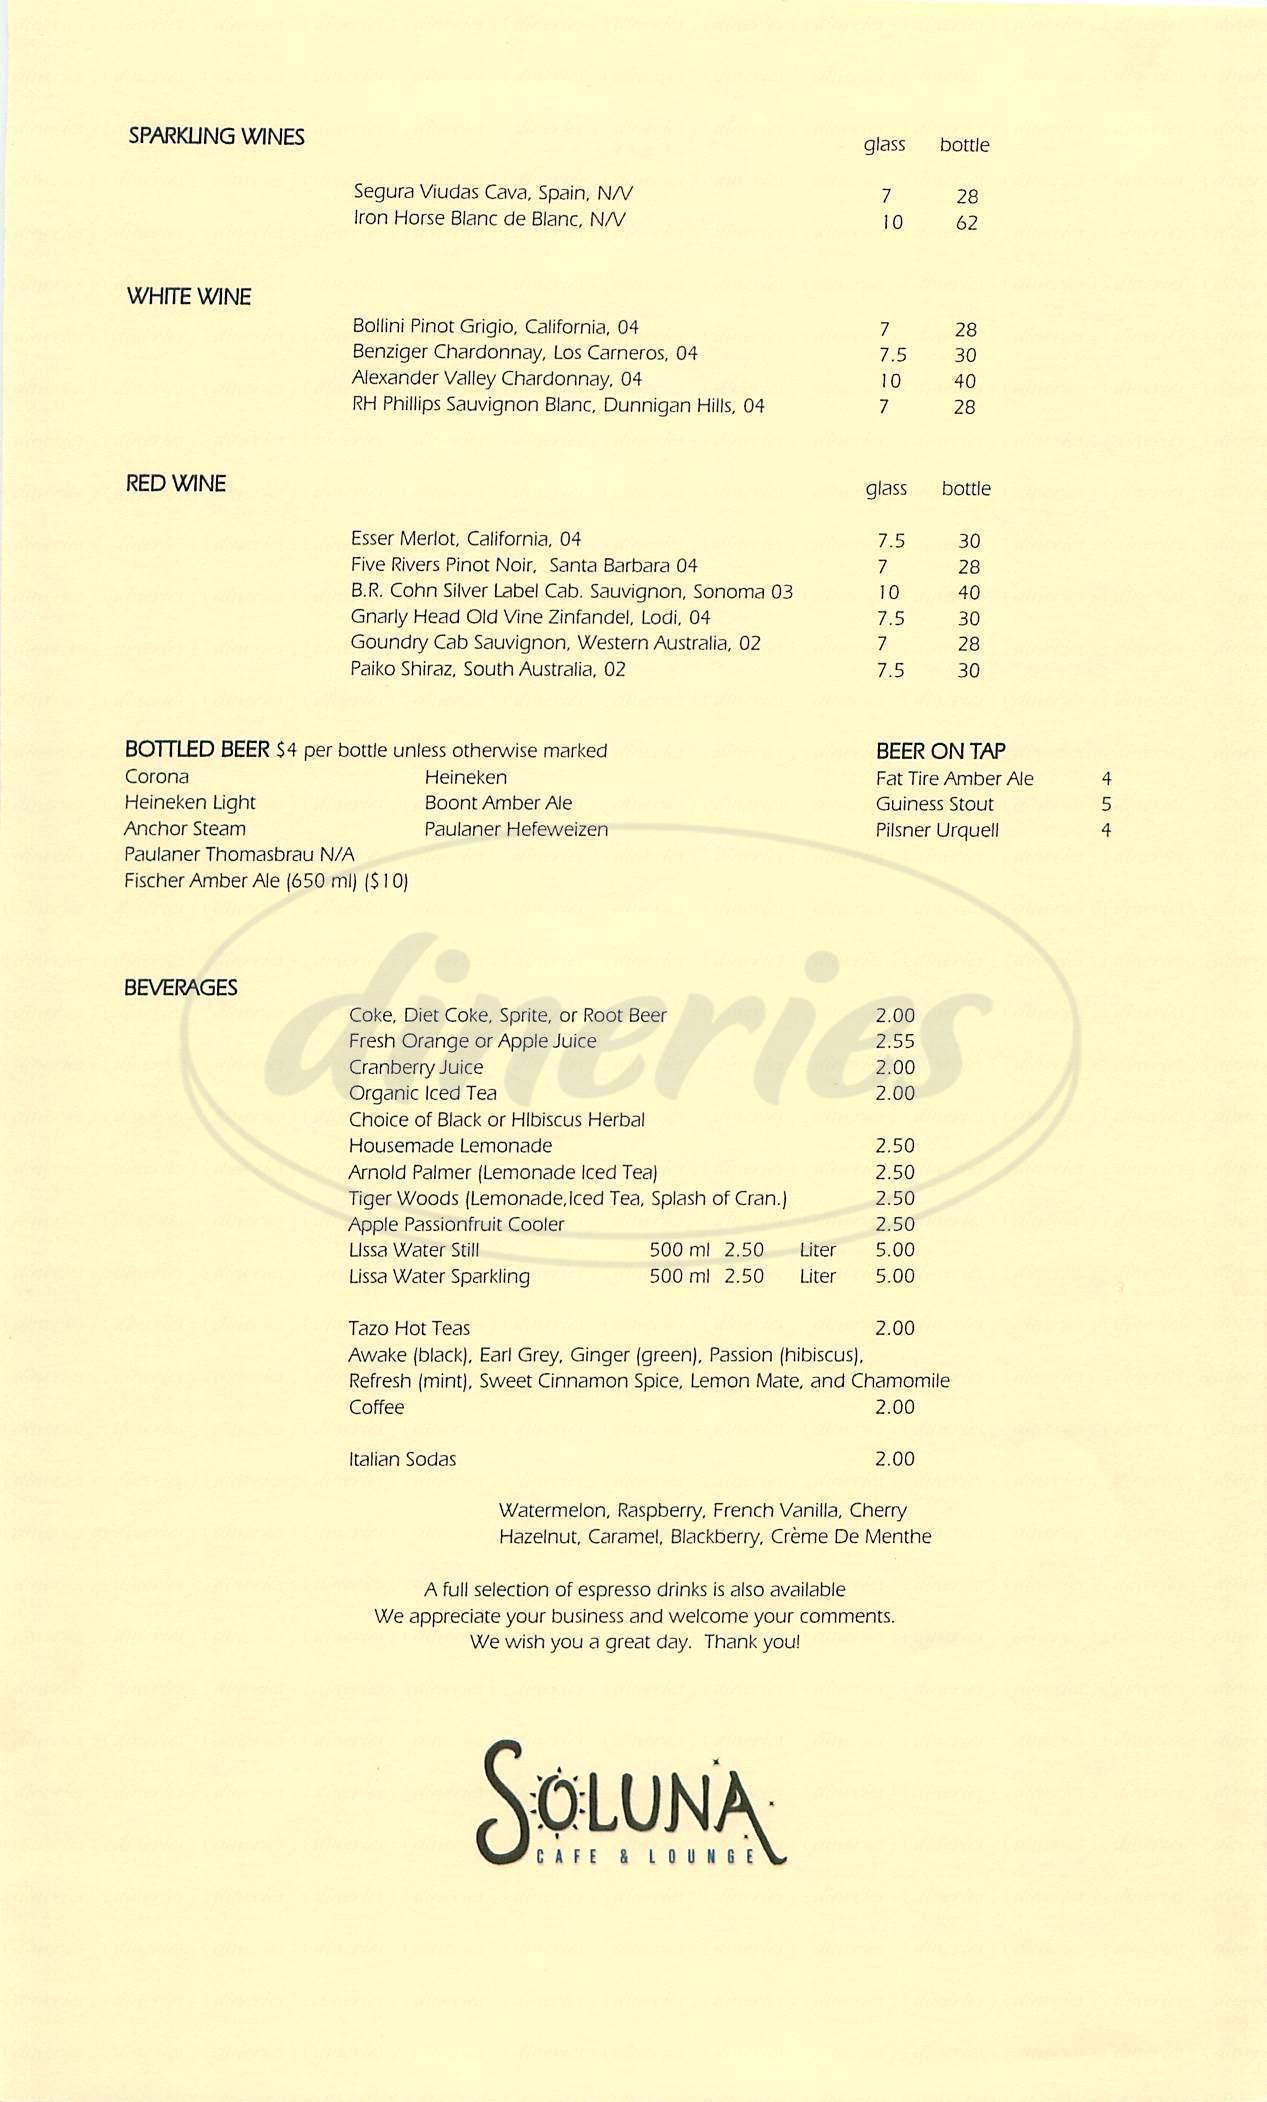 menu for Soluna Café & Lounge